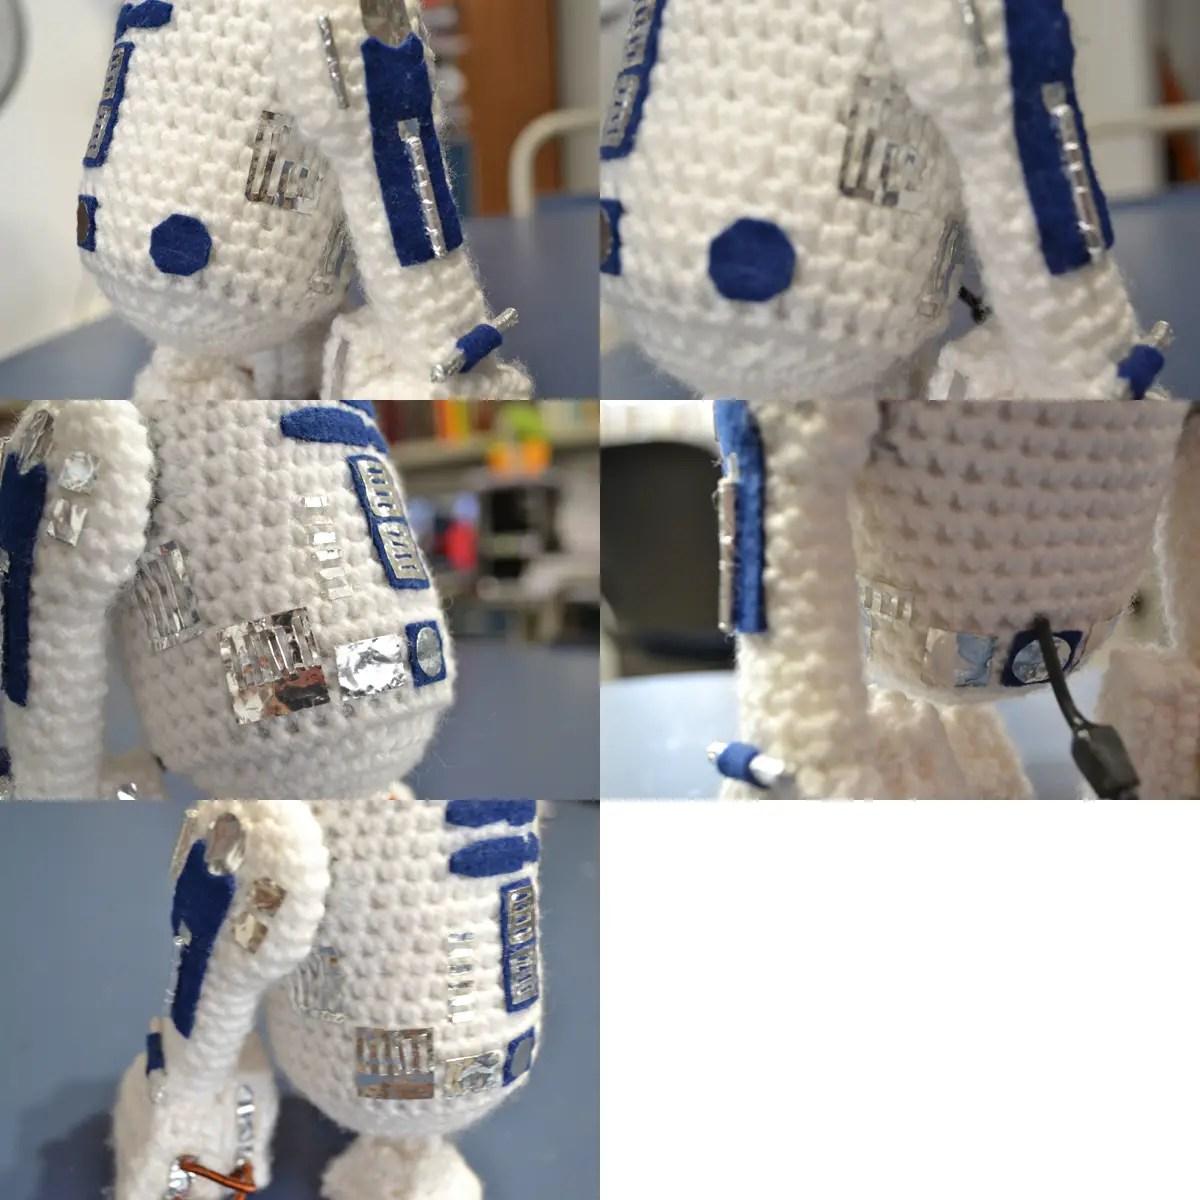 R2-D2 Droid Crochet Hat Tutorial inspired by Star Wars | Crochet ... | 1200x1200